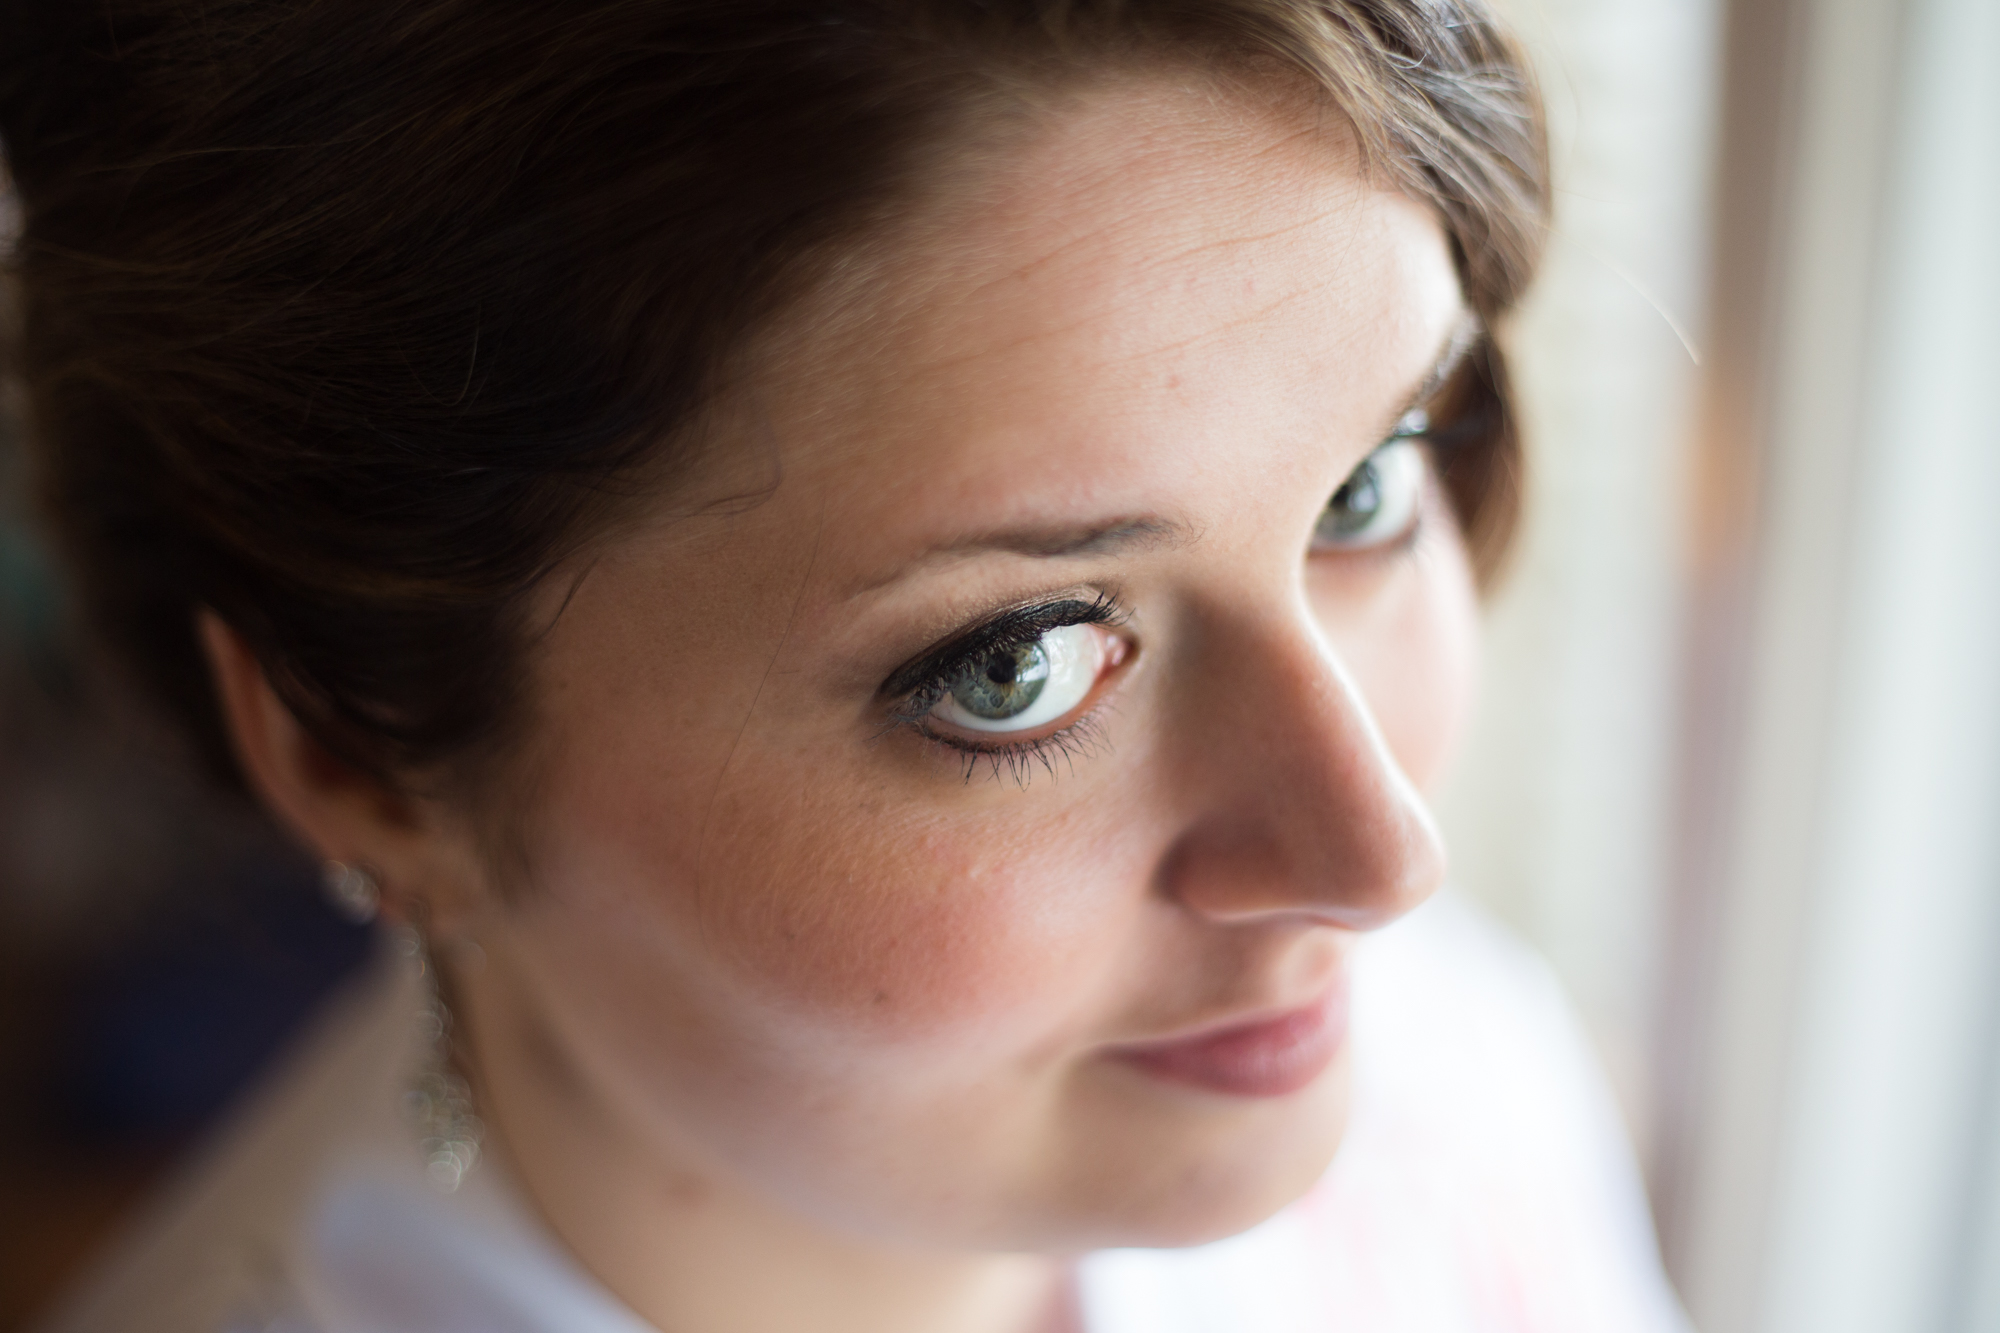 01-KylieBryanBlog.JPG